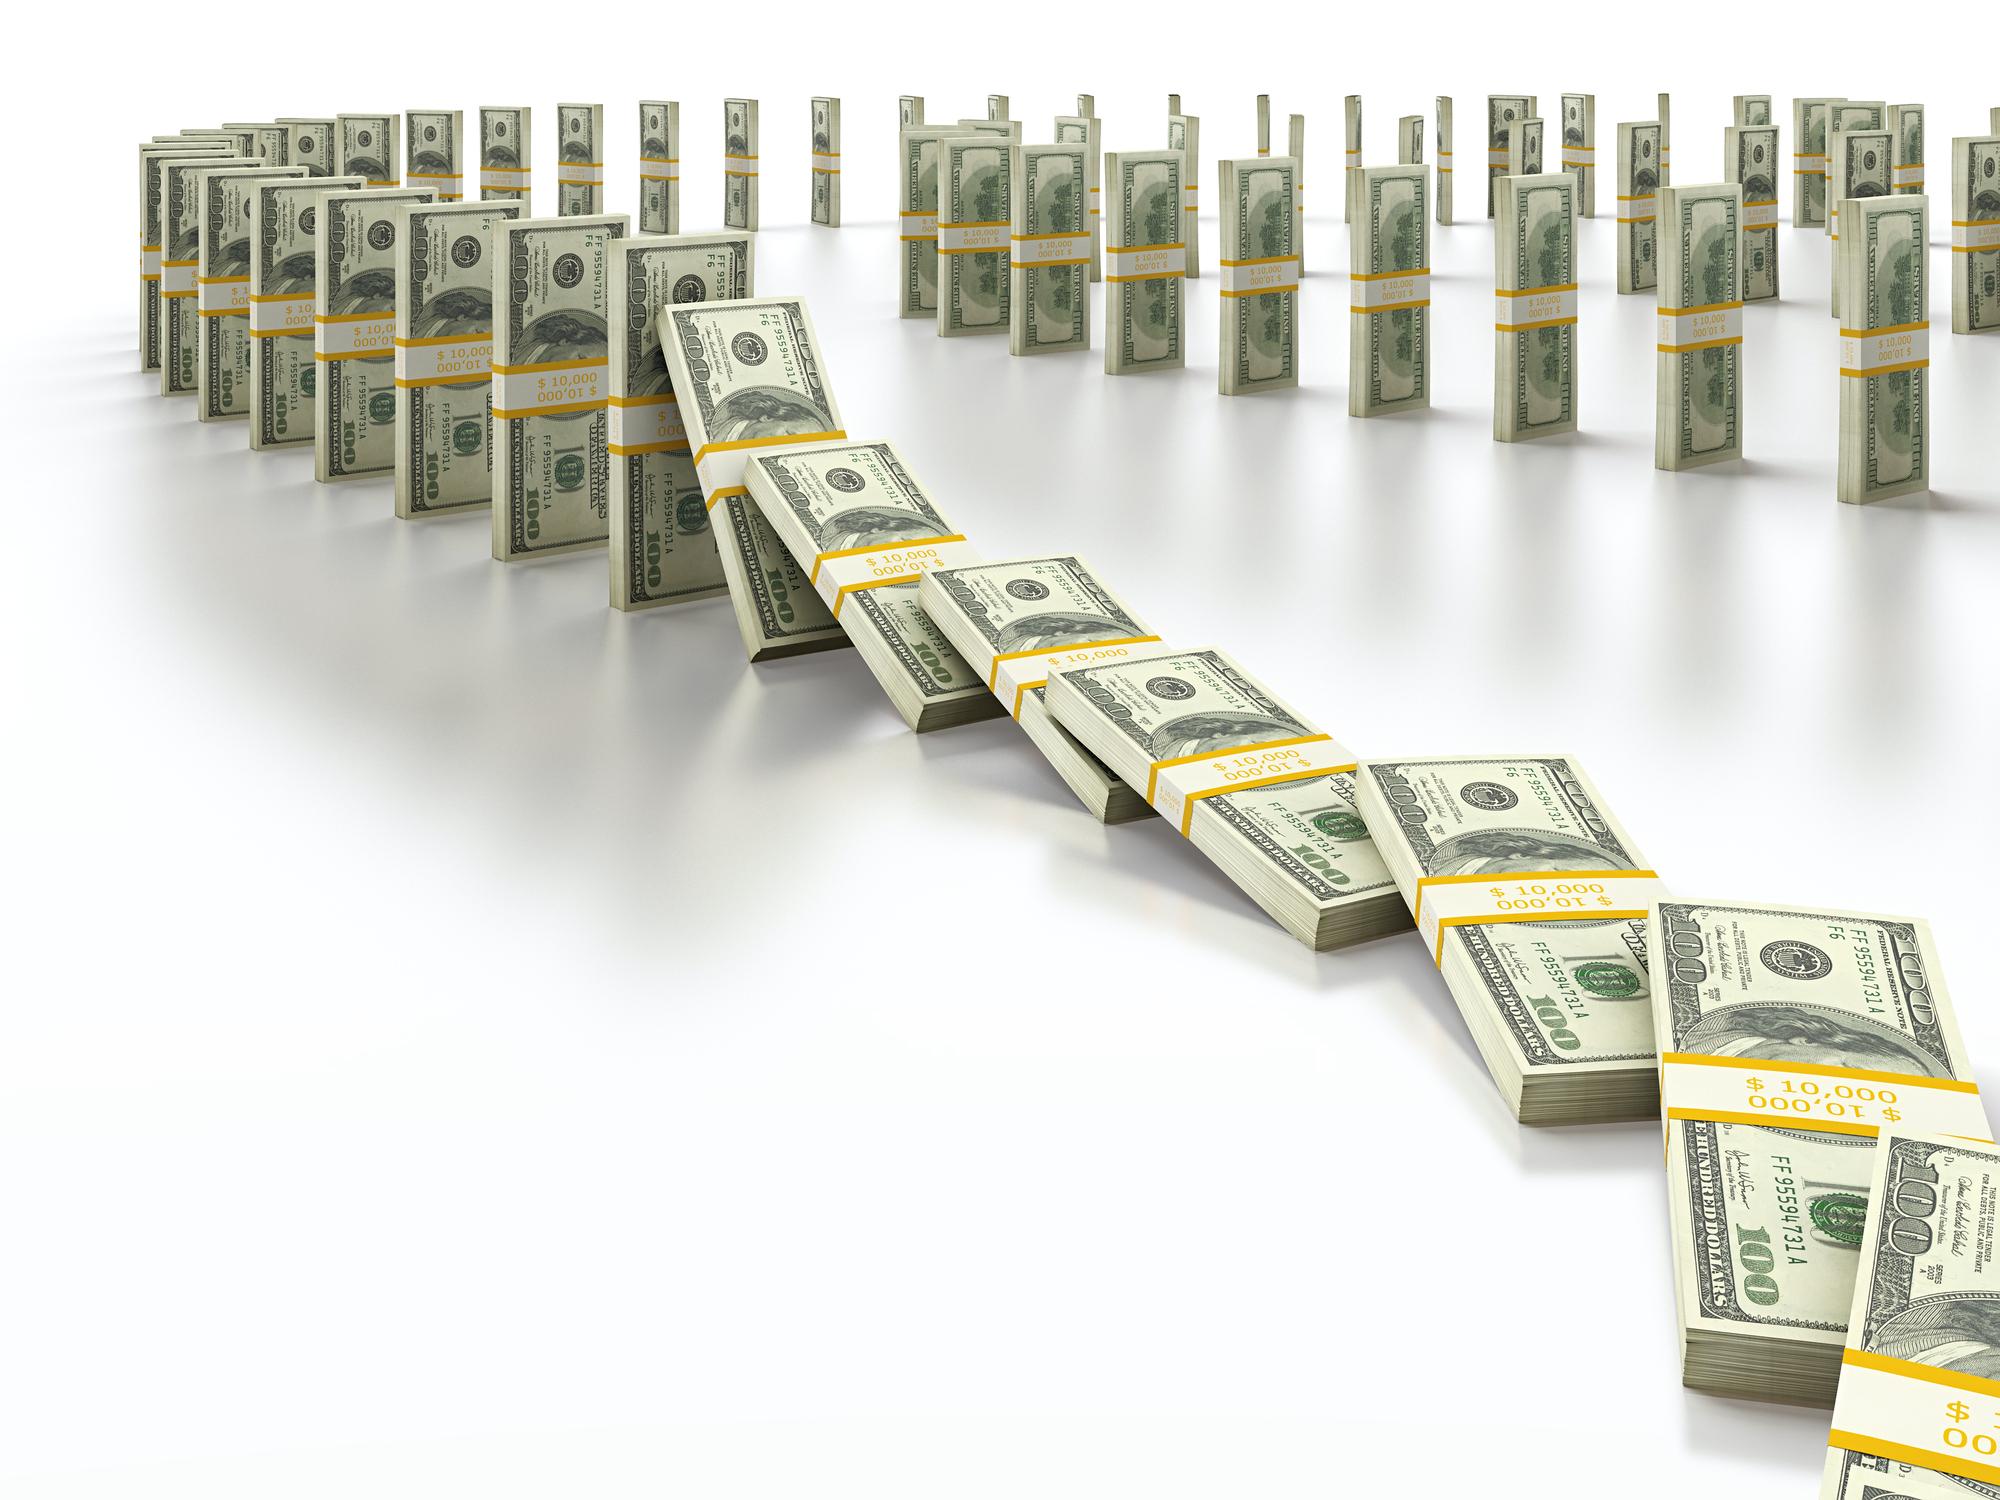 Dollars stacked like dominoes.